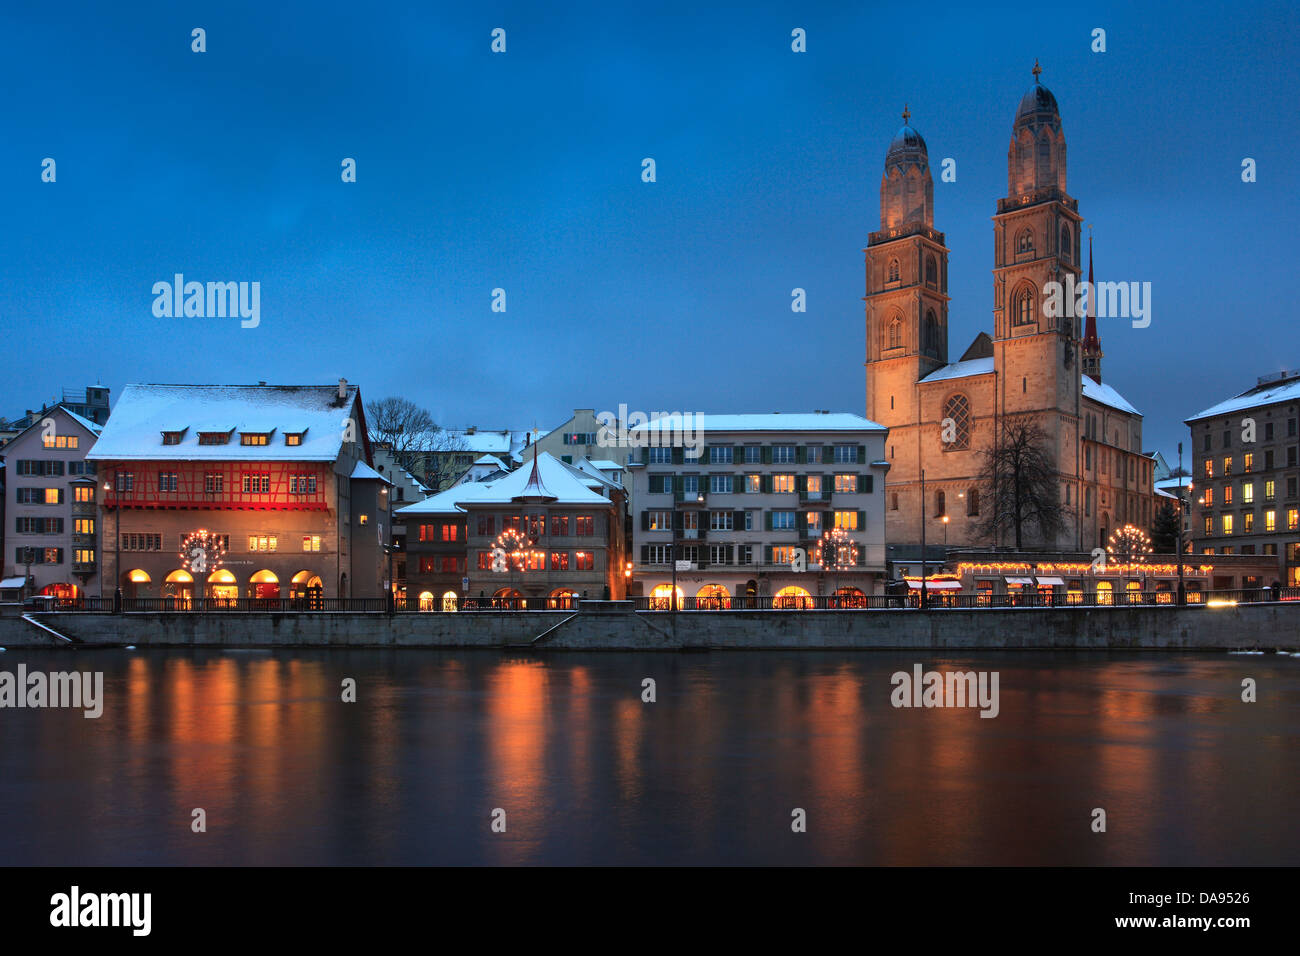 Advent, lighting, illumination, Advent time, Old Town, city, dusk, twilight, Grossmünster, church, lights, - Stock Image